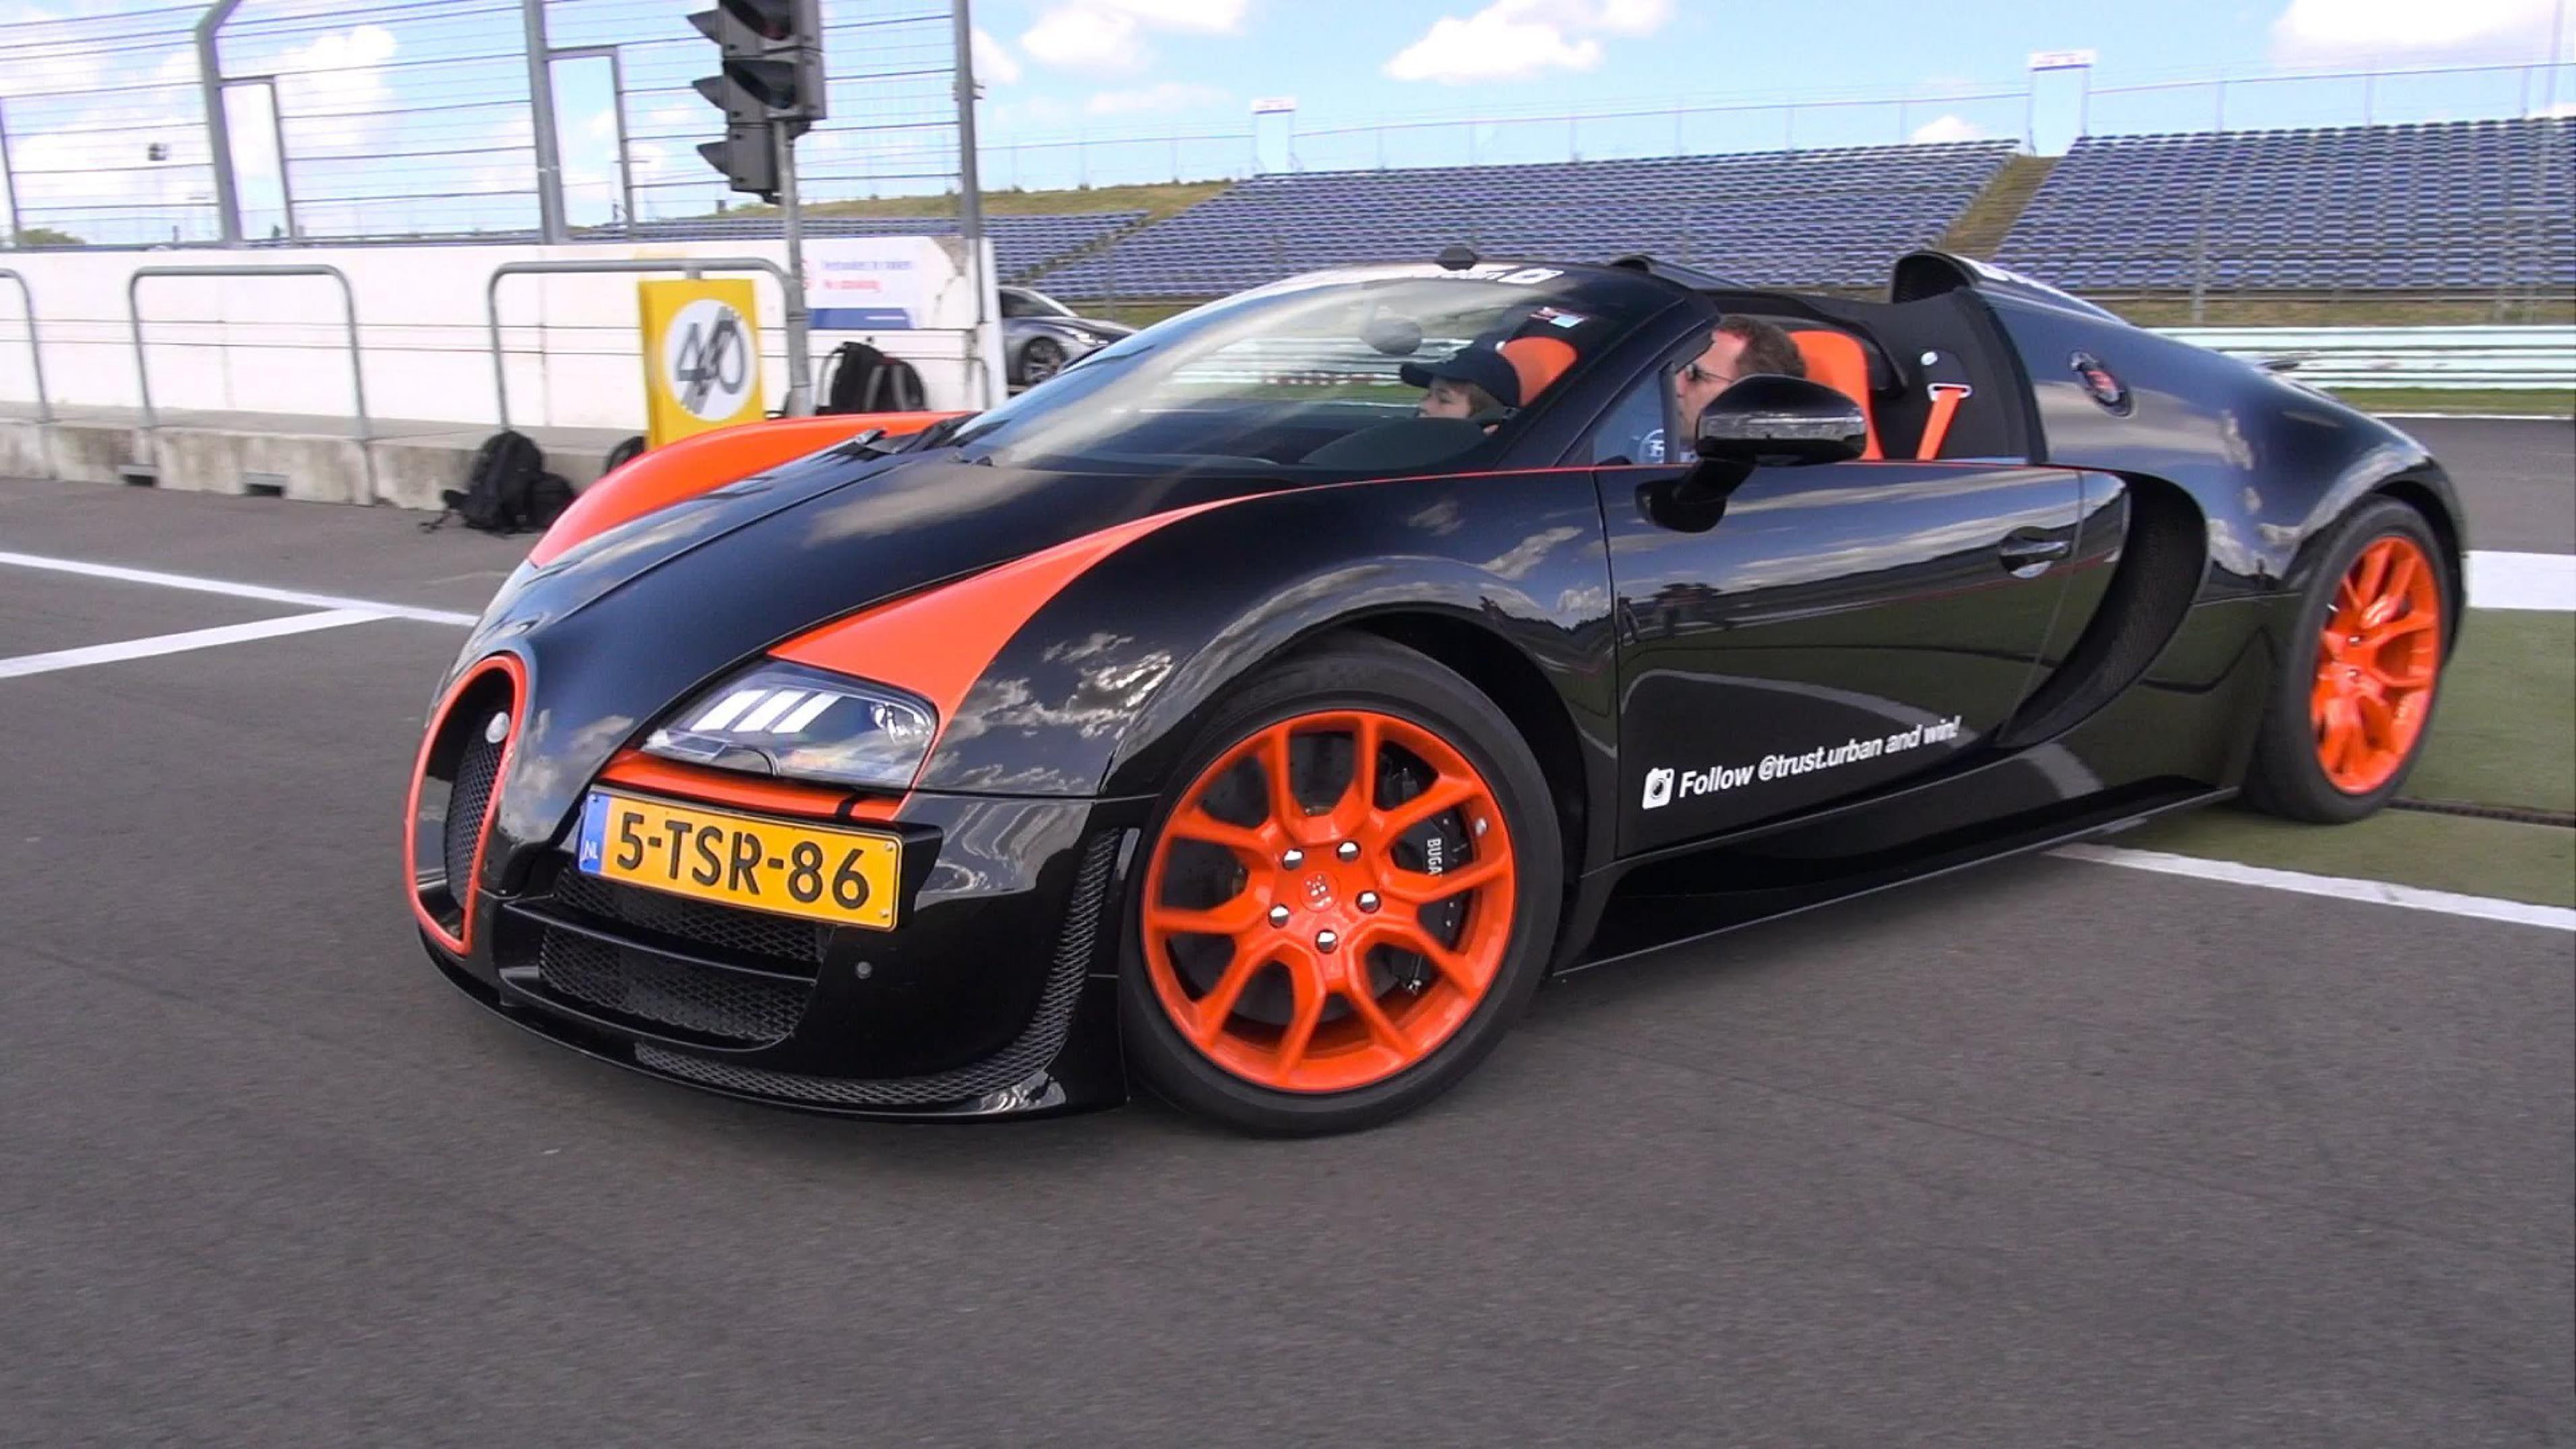 7e91b56e4fc2f353de77c1eabd6d989f Surprising Bugatti Veyron 16.4 Grand Sport Vitesse Acceleration Cars Trend